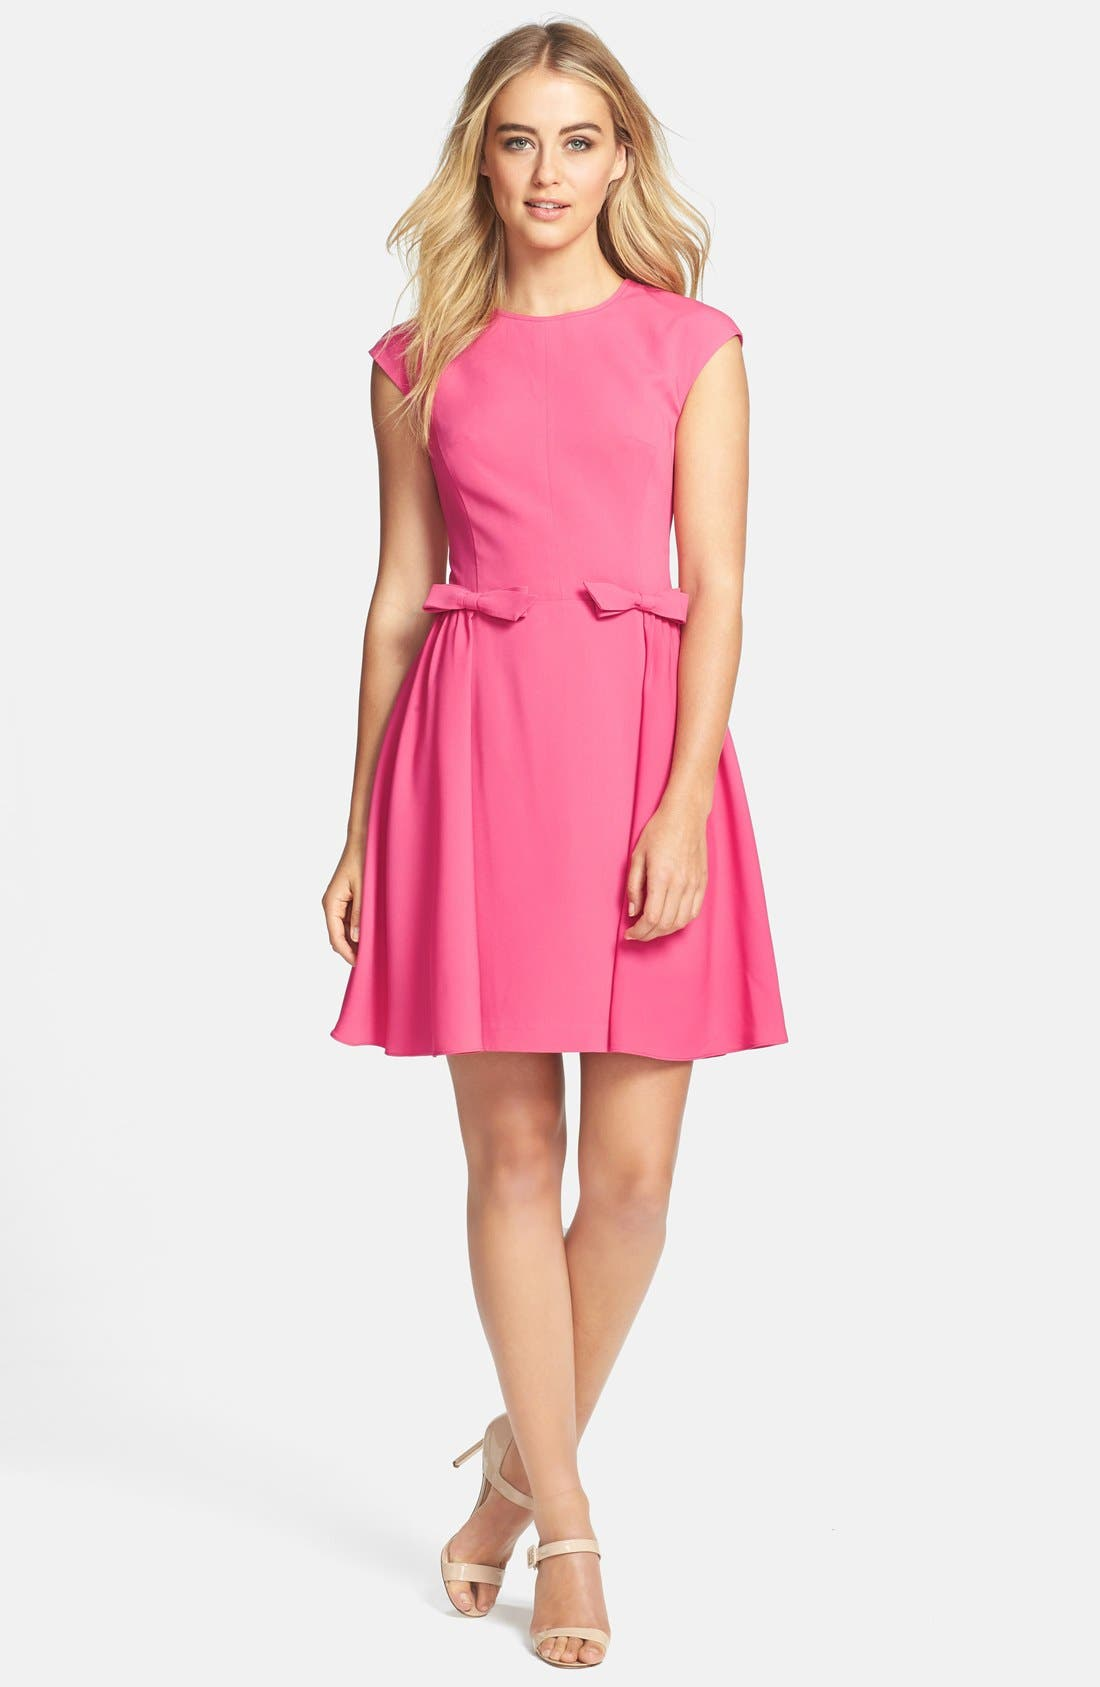 Main Image - Jill Jill Stuart Bow Detail Crepe Fit & Flare Dress